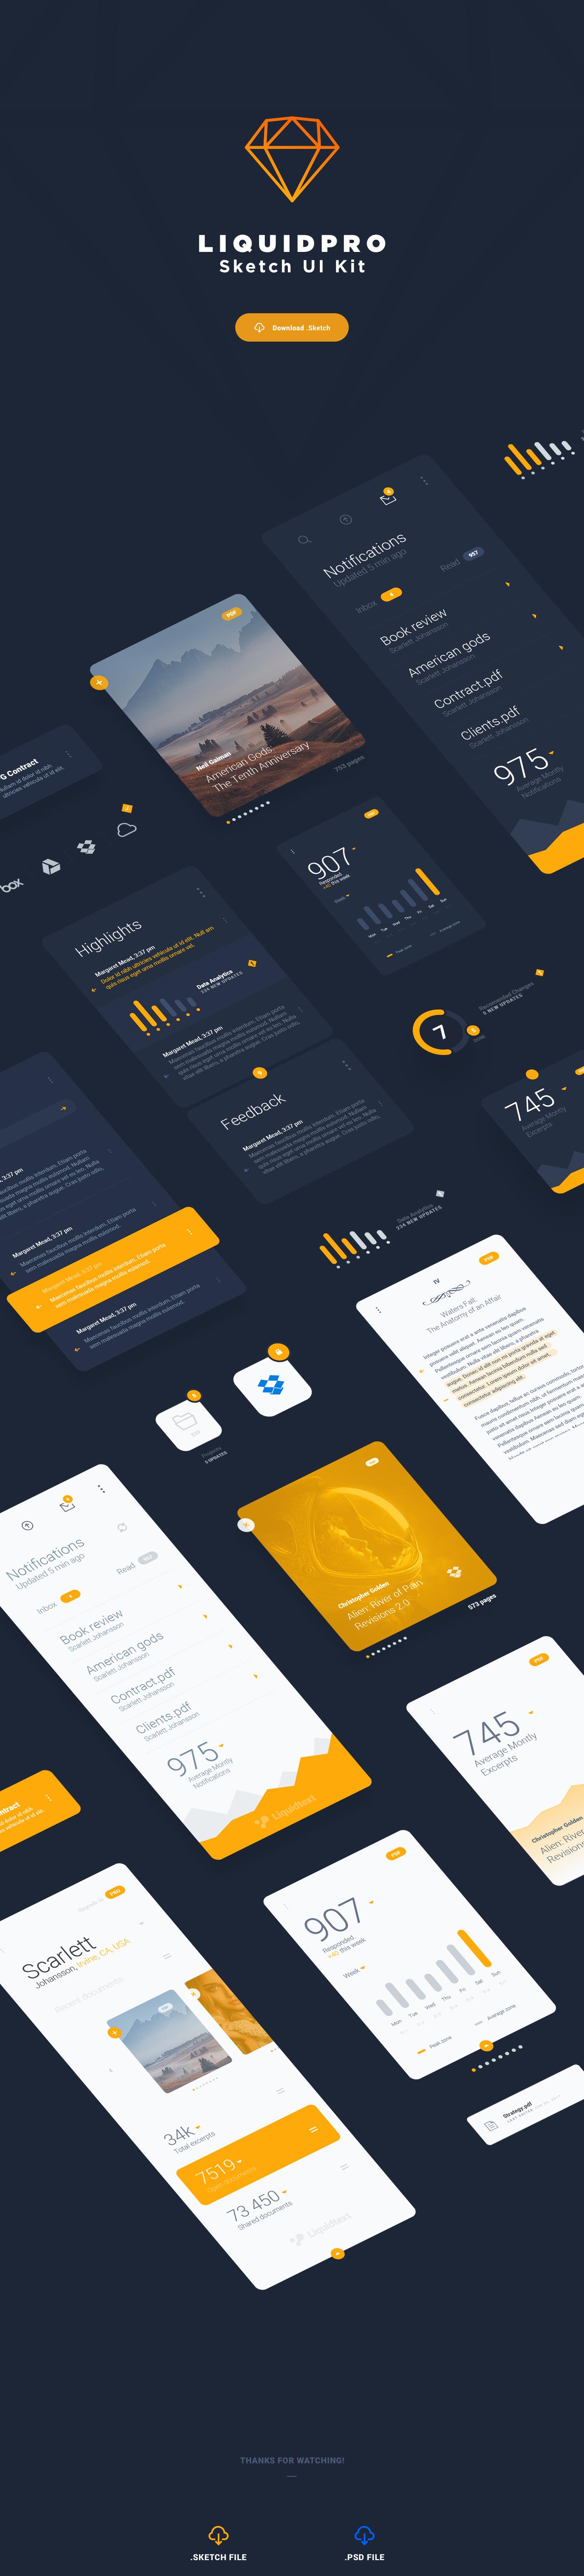 sketch kit UI ux Platform ios freebie application design free